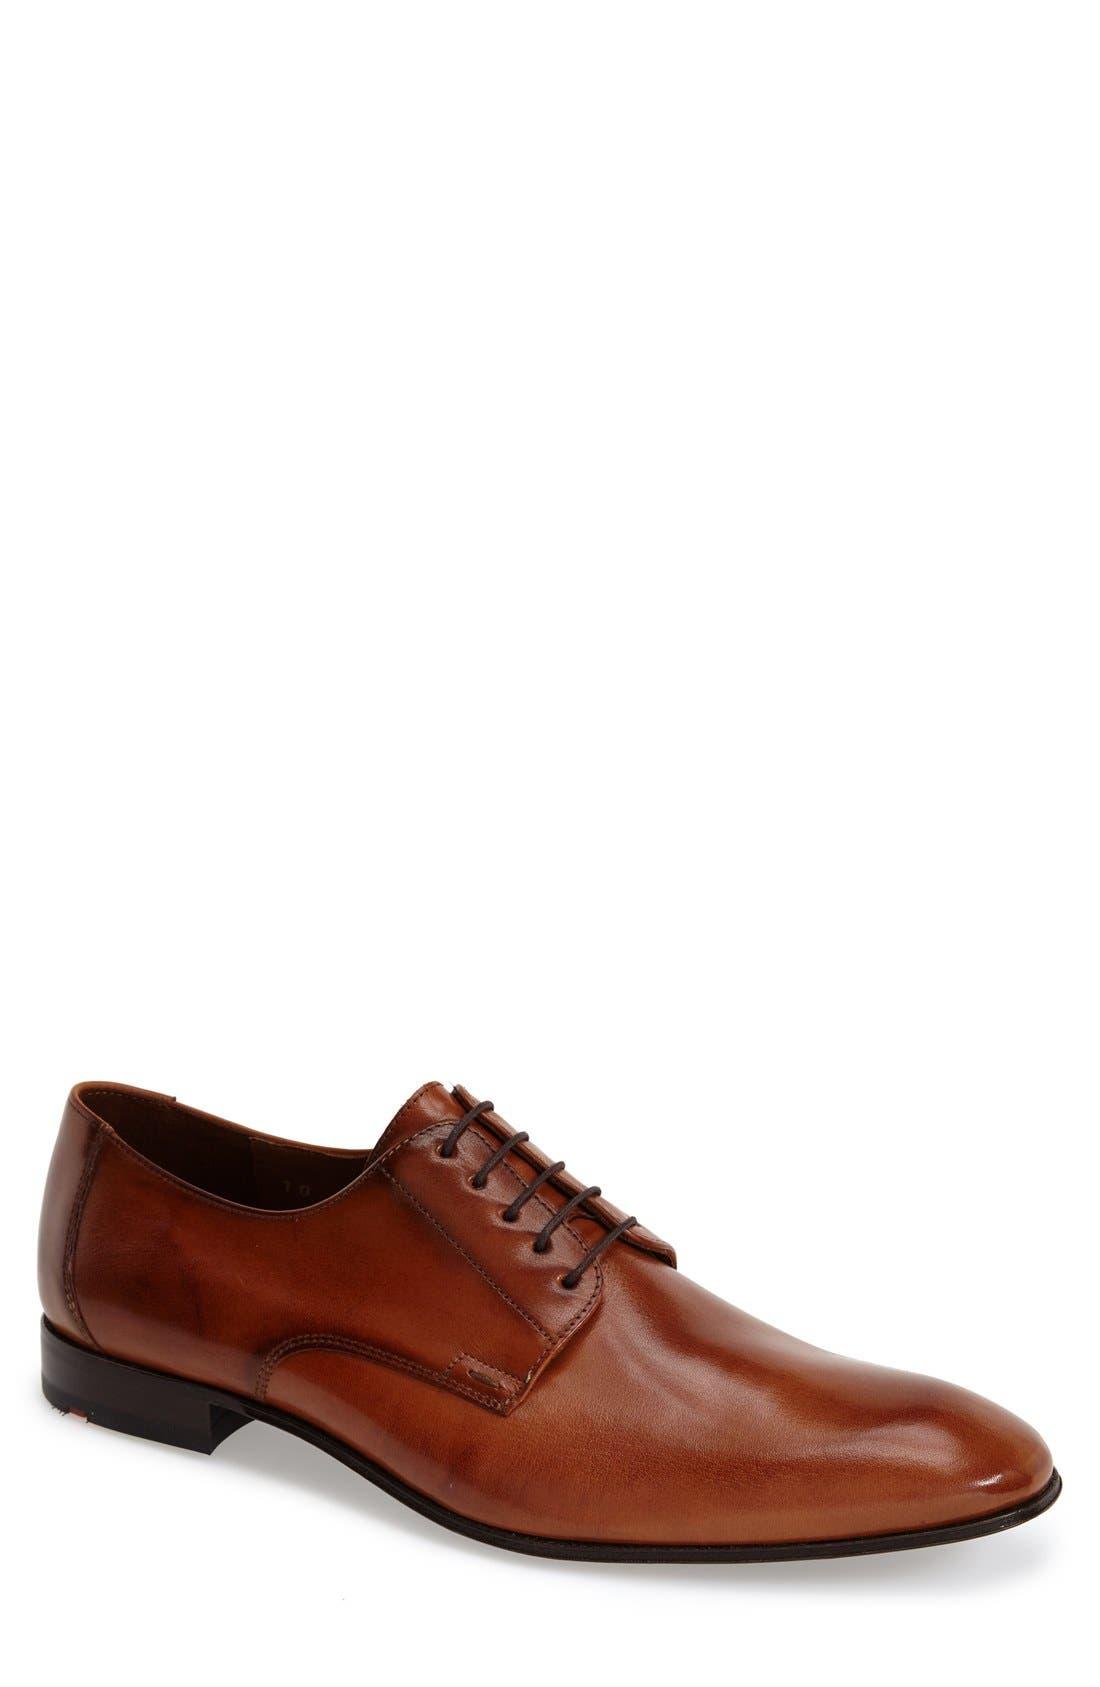 'Laurin' Plain Toe Derby,                             Main thumbnail 1, color,                             Light Brown